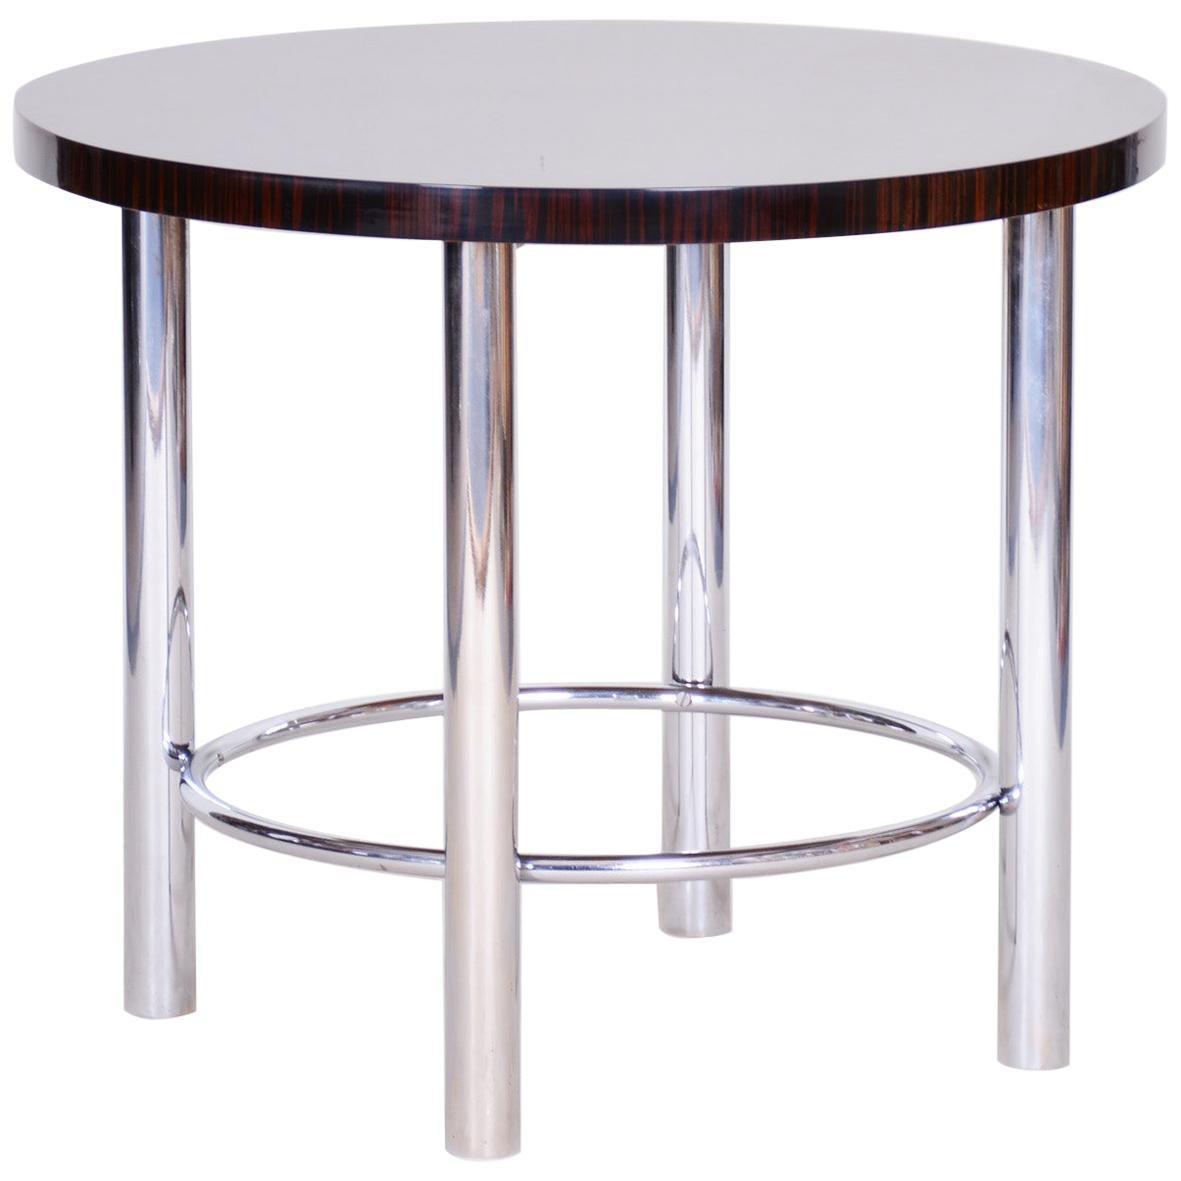 20th Century Restored Chrome Round Macassar Bauhaus Table, Mücke-Melder, 1930s